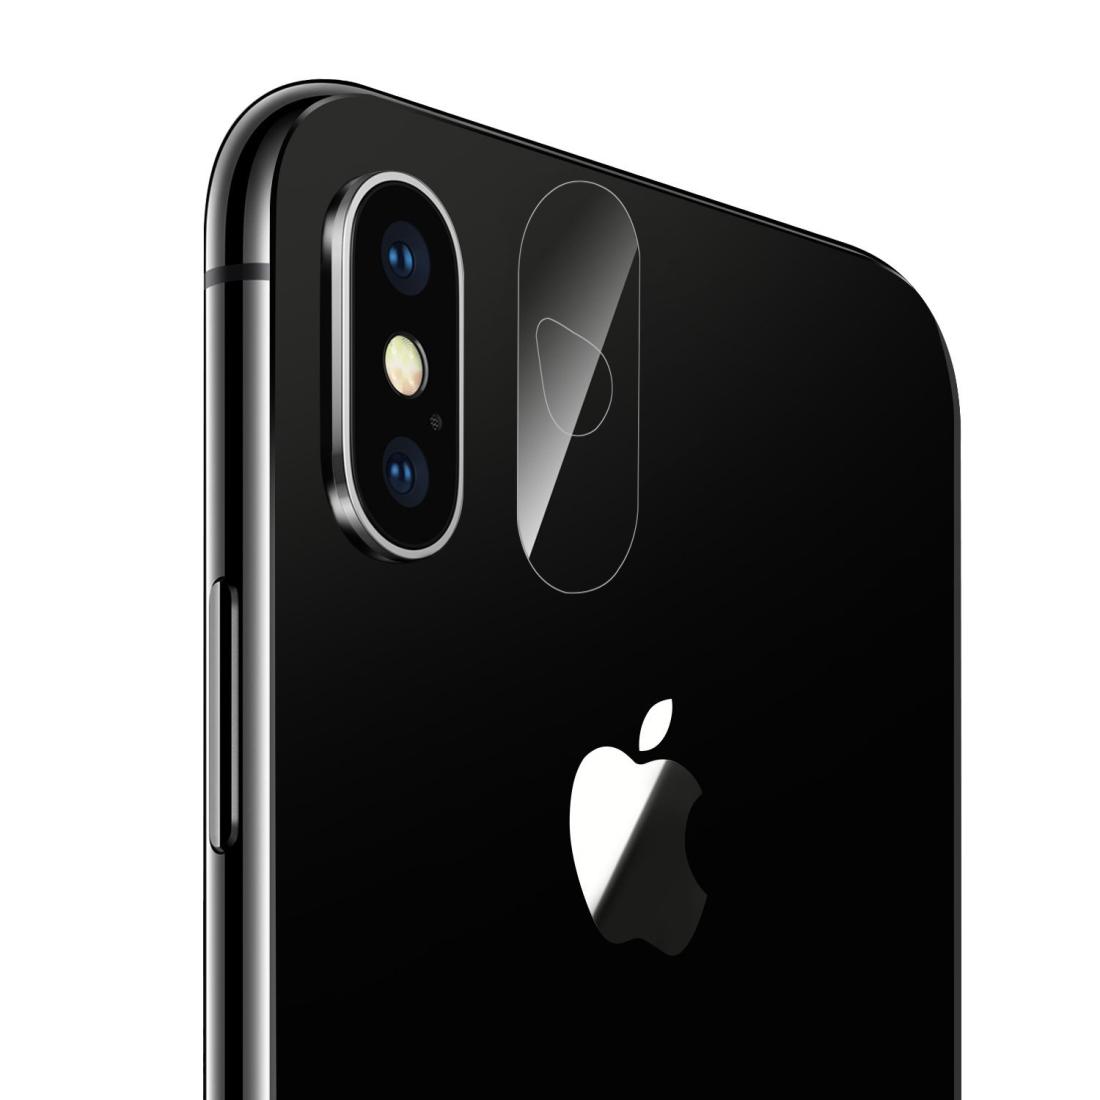 Verre trempé Apple iPhone Xs Max Protection ecran Protection verre trempé... par LeGuide.com Publicité